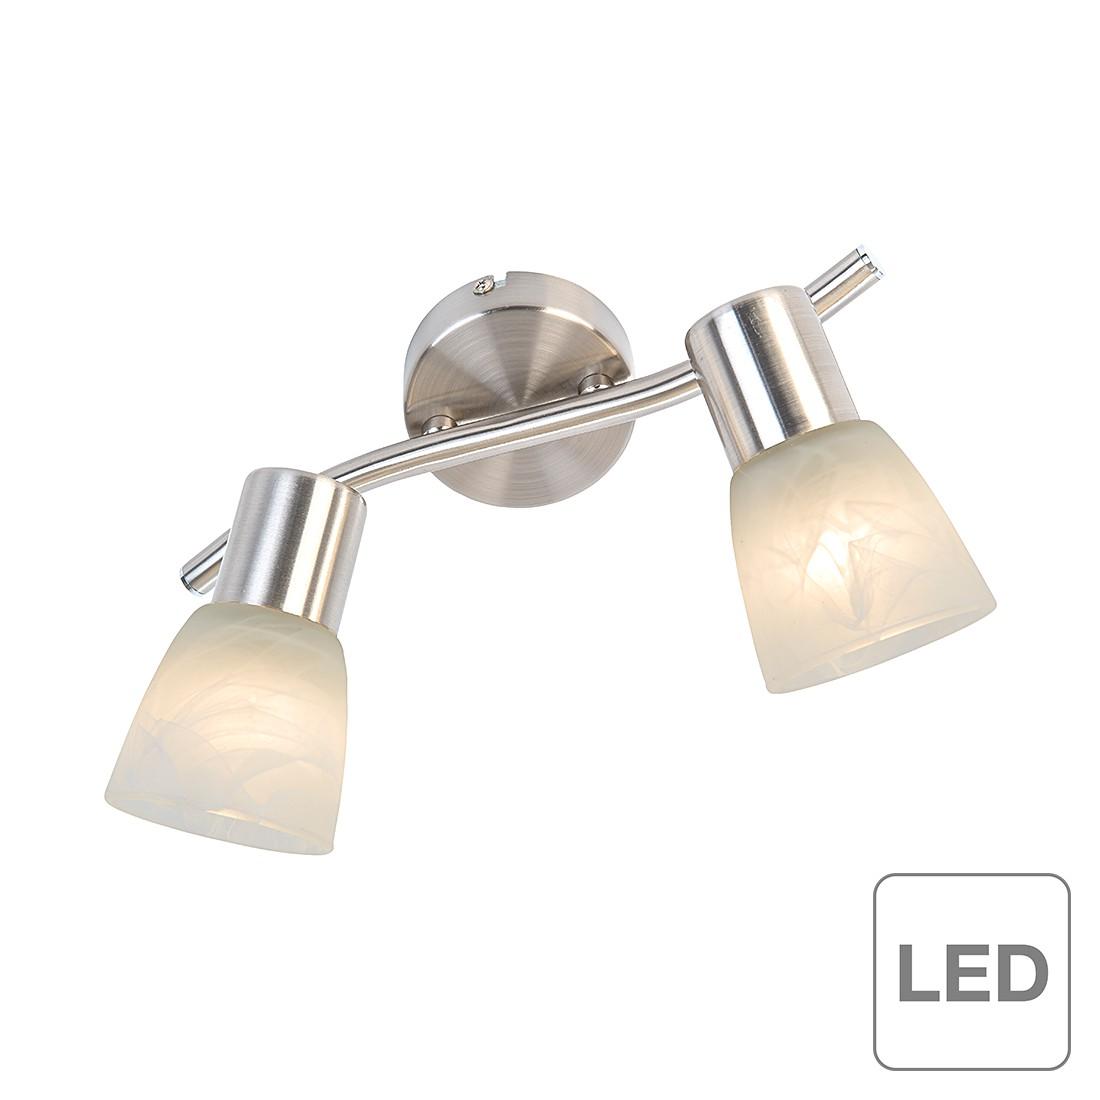 LED-Balken Ancona - 2-flammig, Nino Leuchten